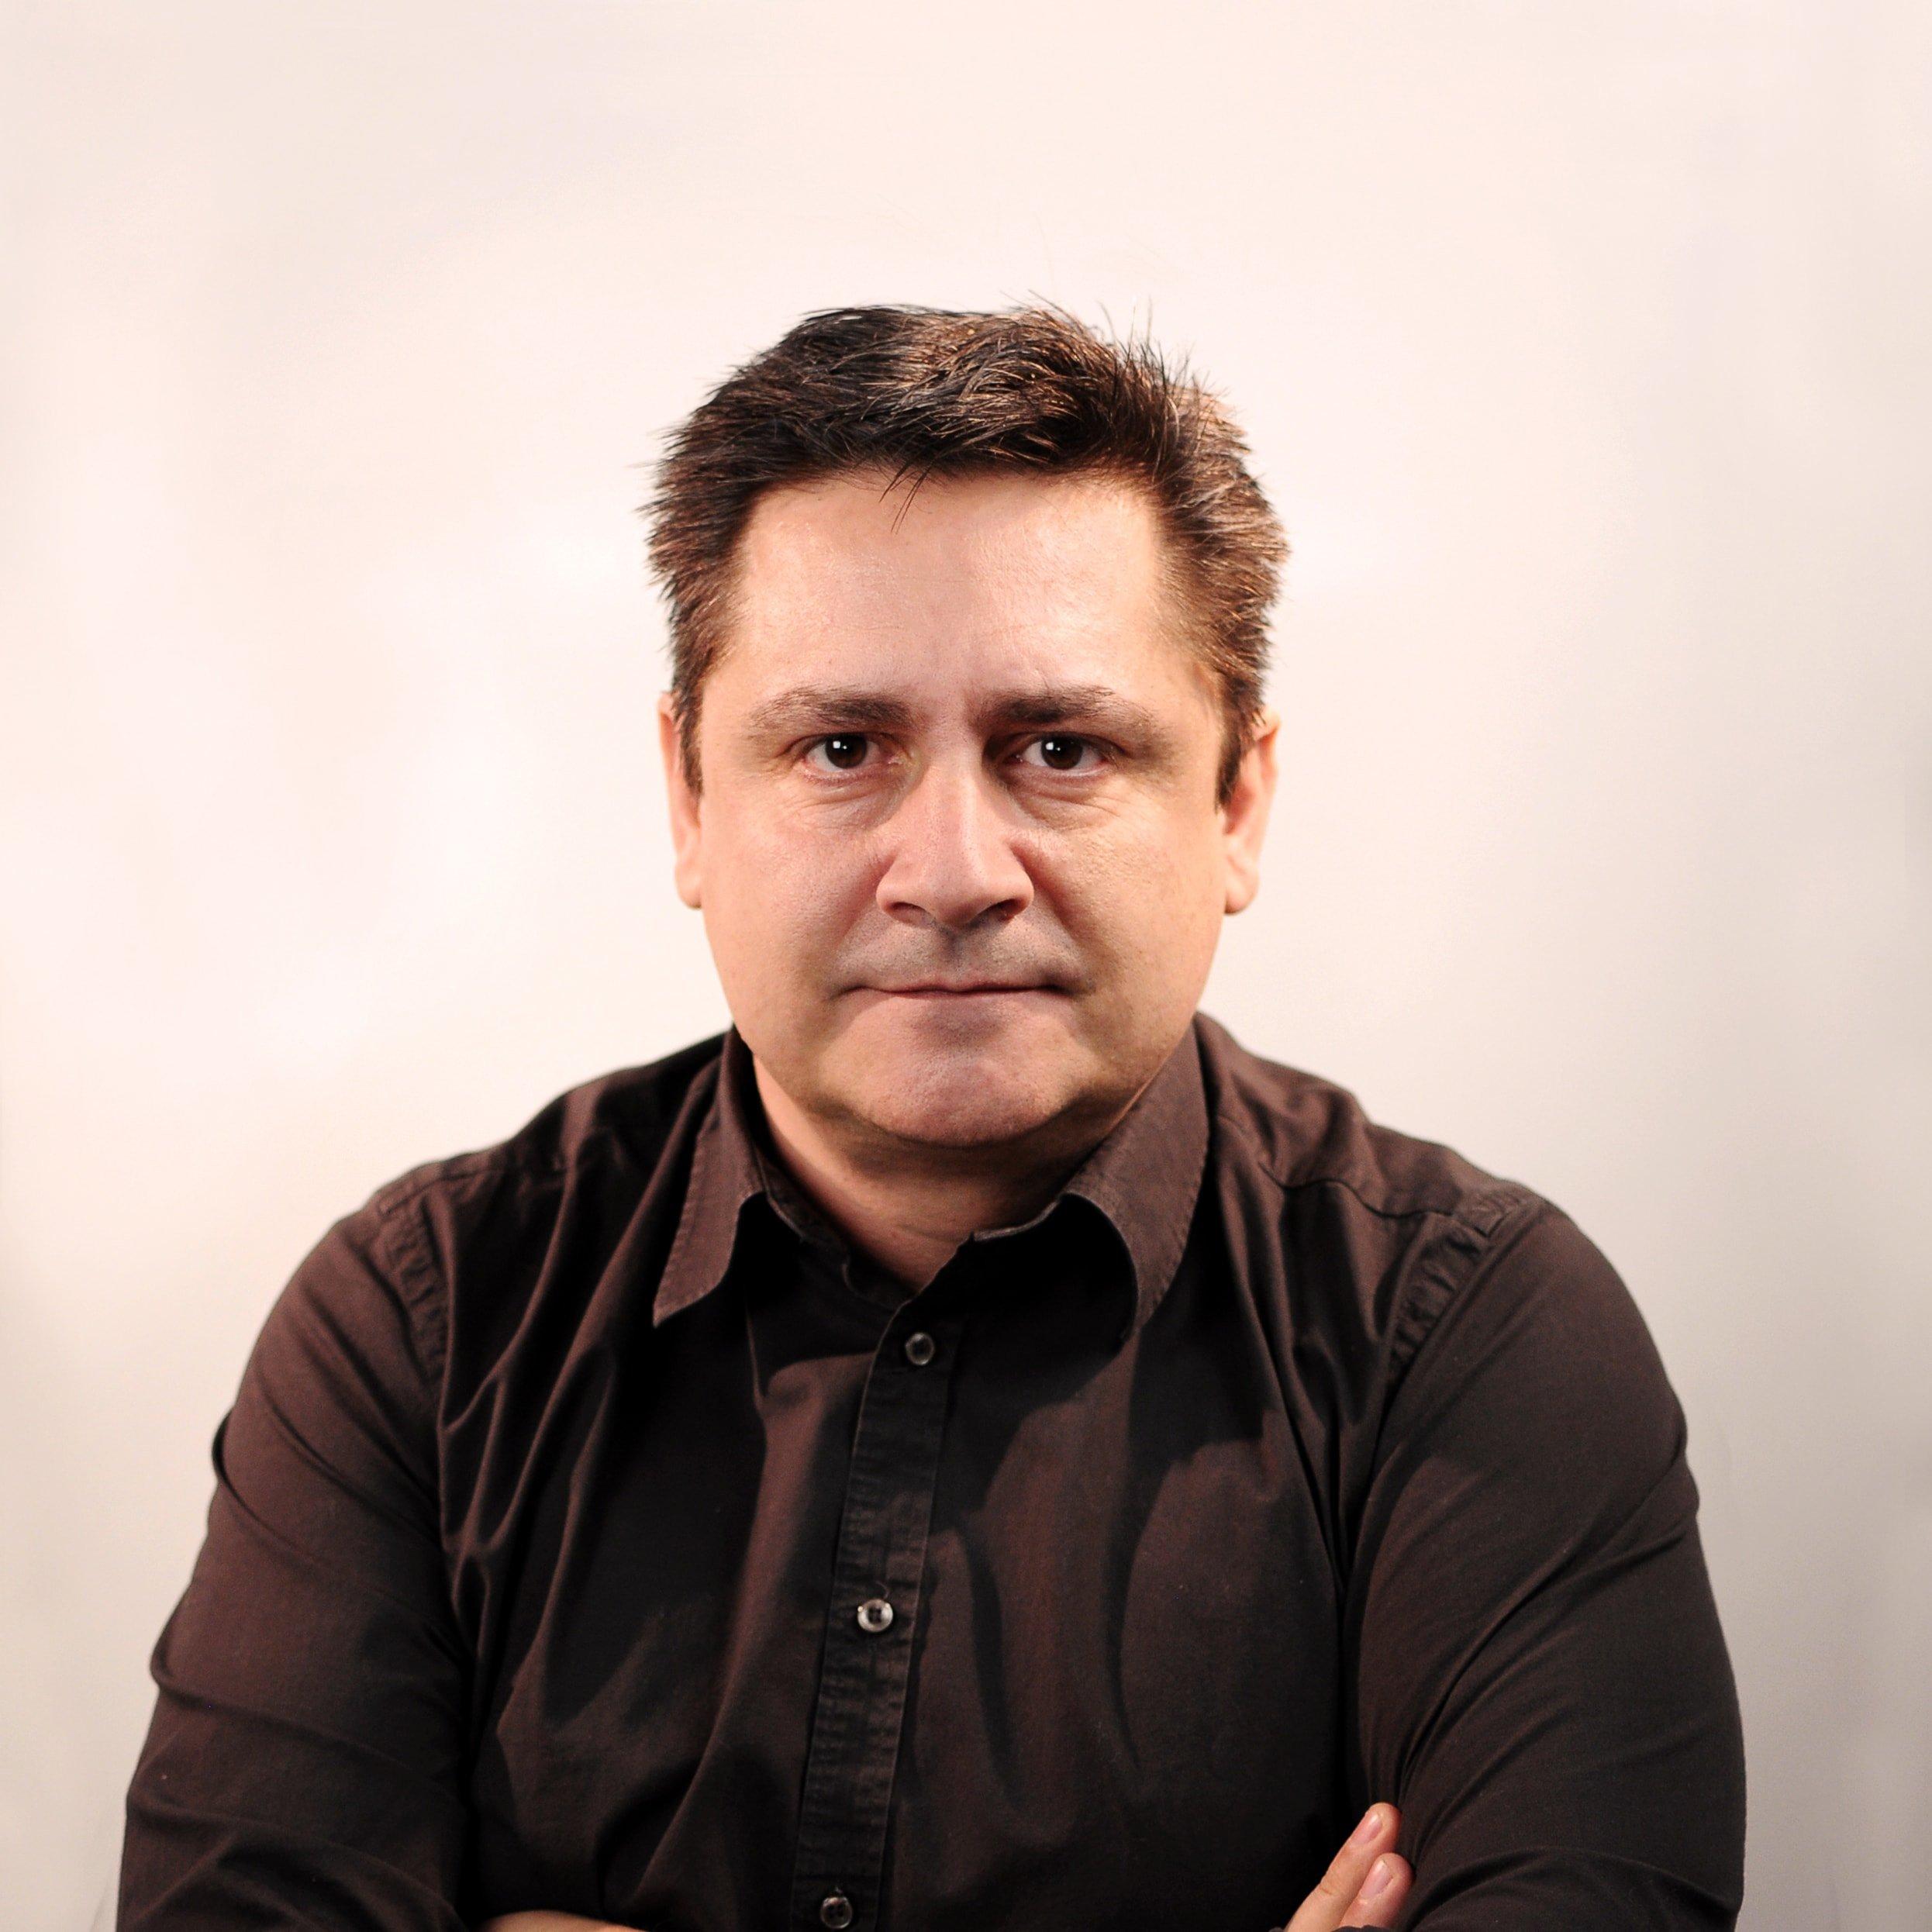 Enrique Ilzarbe